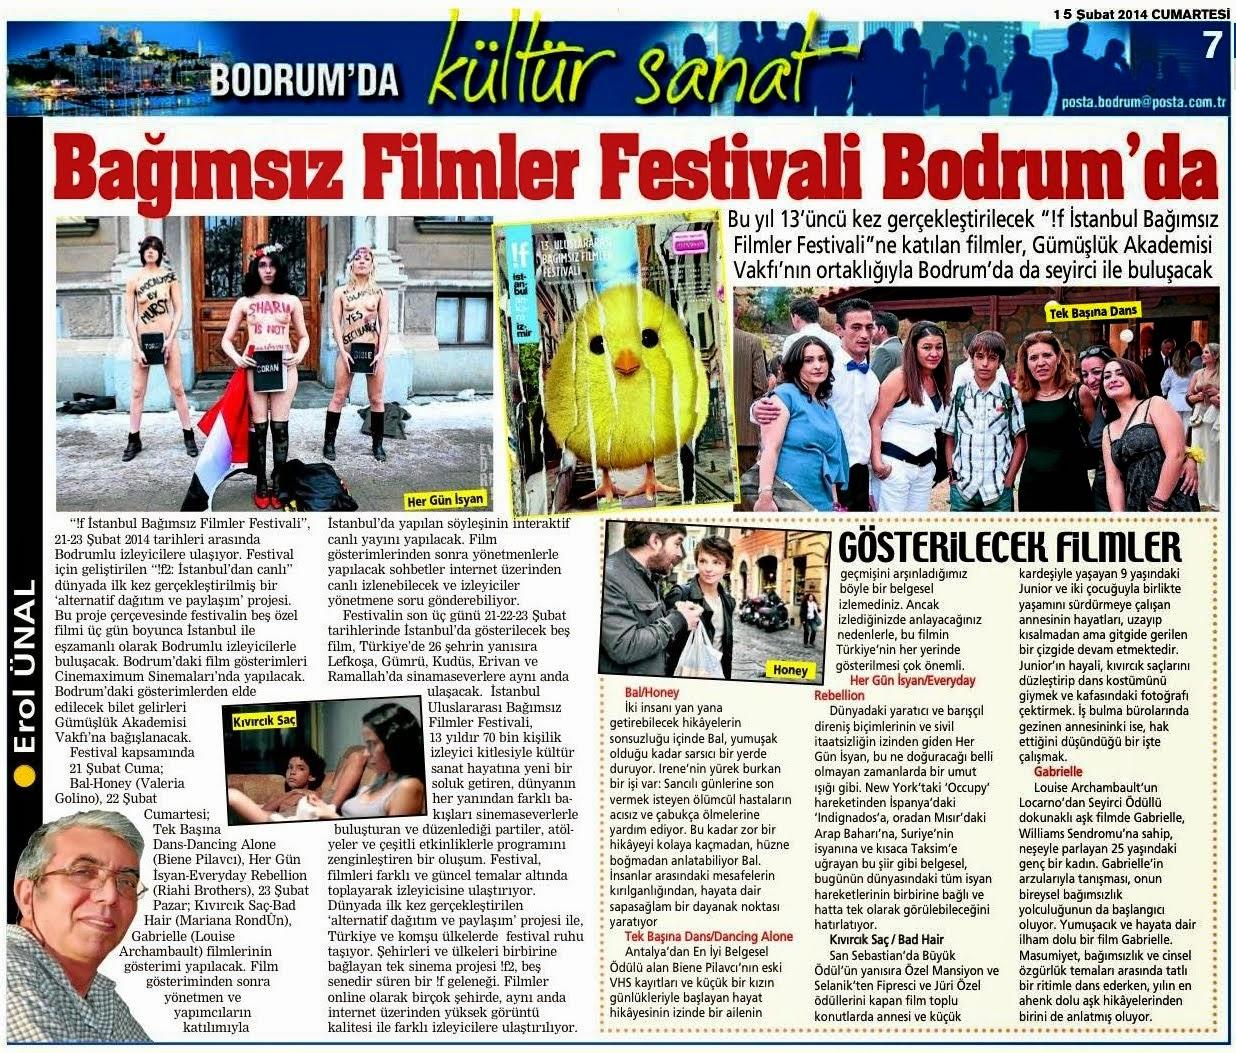 31 BAGIMSIZ FİLMLER FESTİVALİ